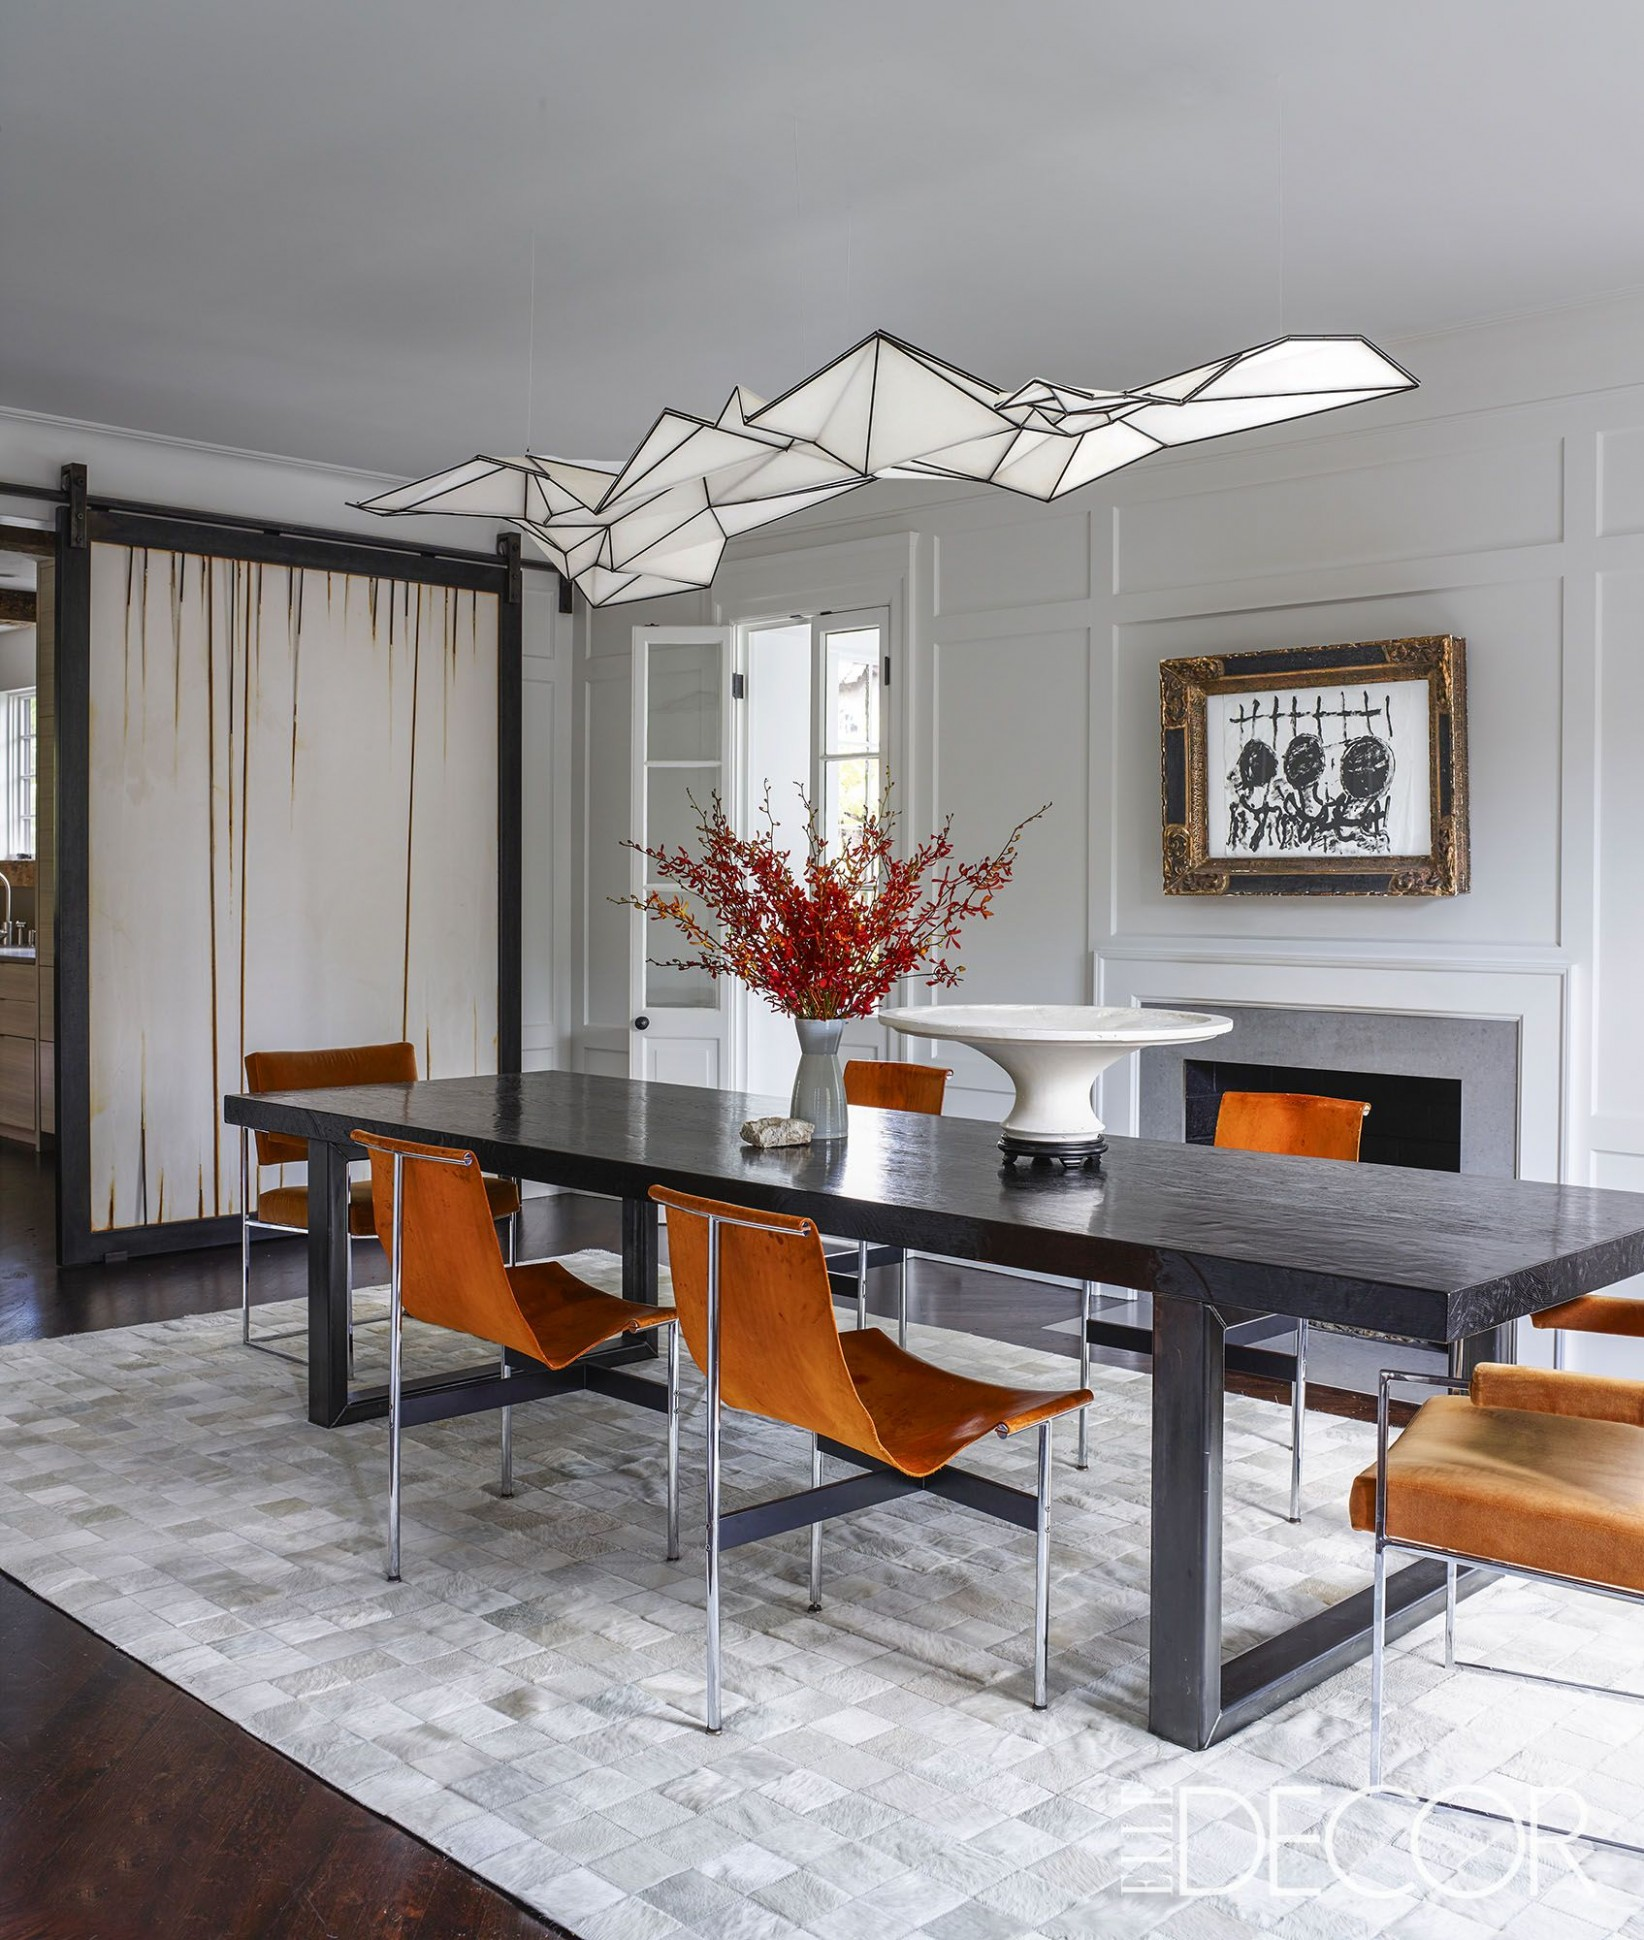 11+ Best Dining Room Light Fixtures - Chandelier & Pendant  - Dining Room Lighting Ideas Uk